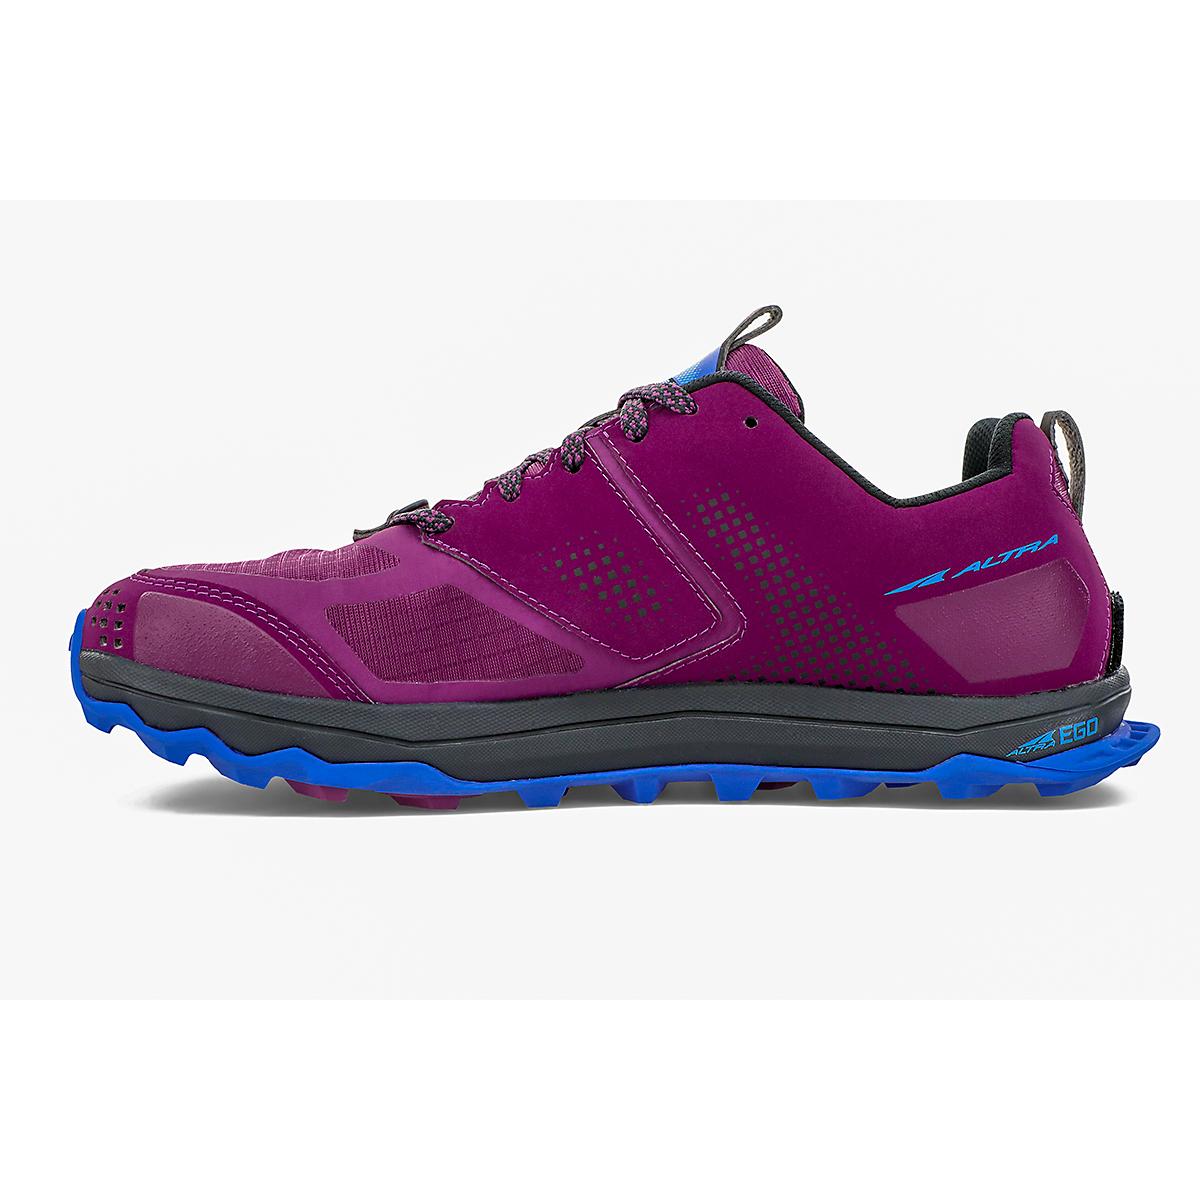 Women's Altra Lone Peak 5 Trail Running Shoe - Color: Plum - Size: 5.5 - Width: Regular, Plum, large, image 2